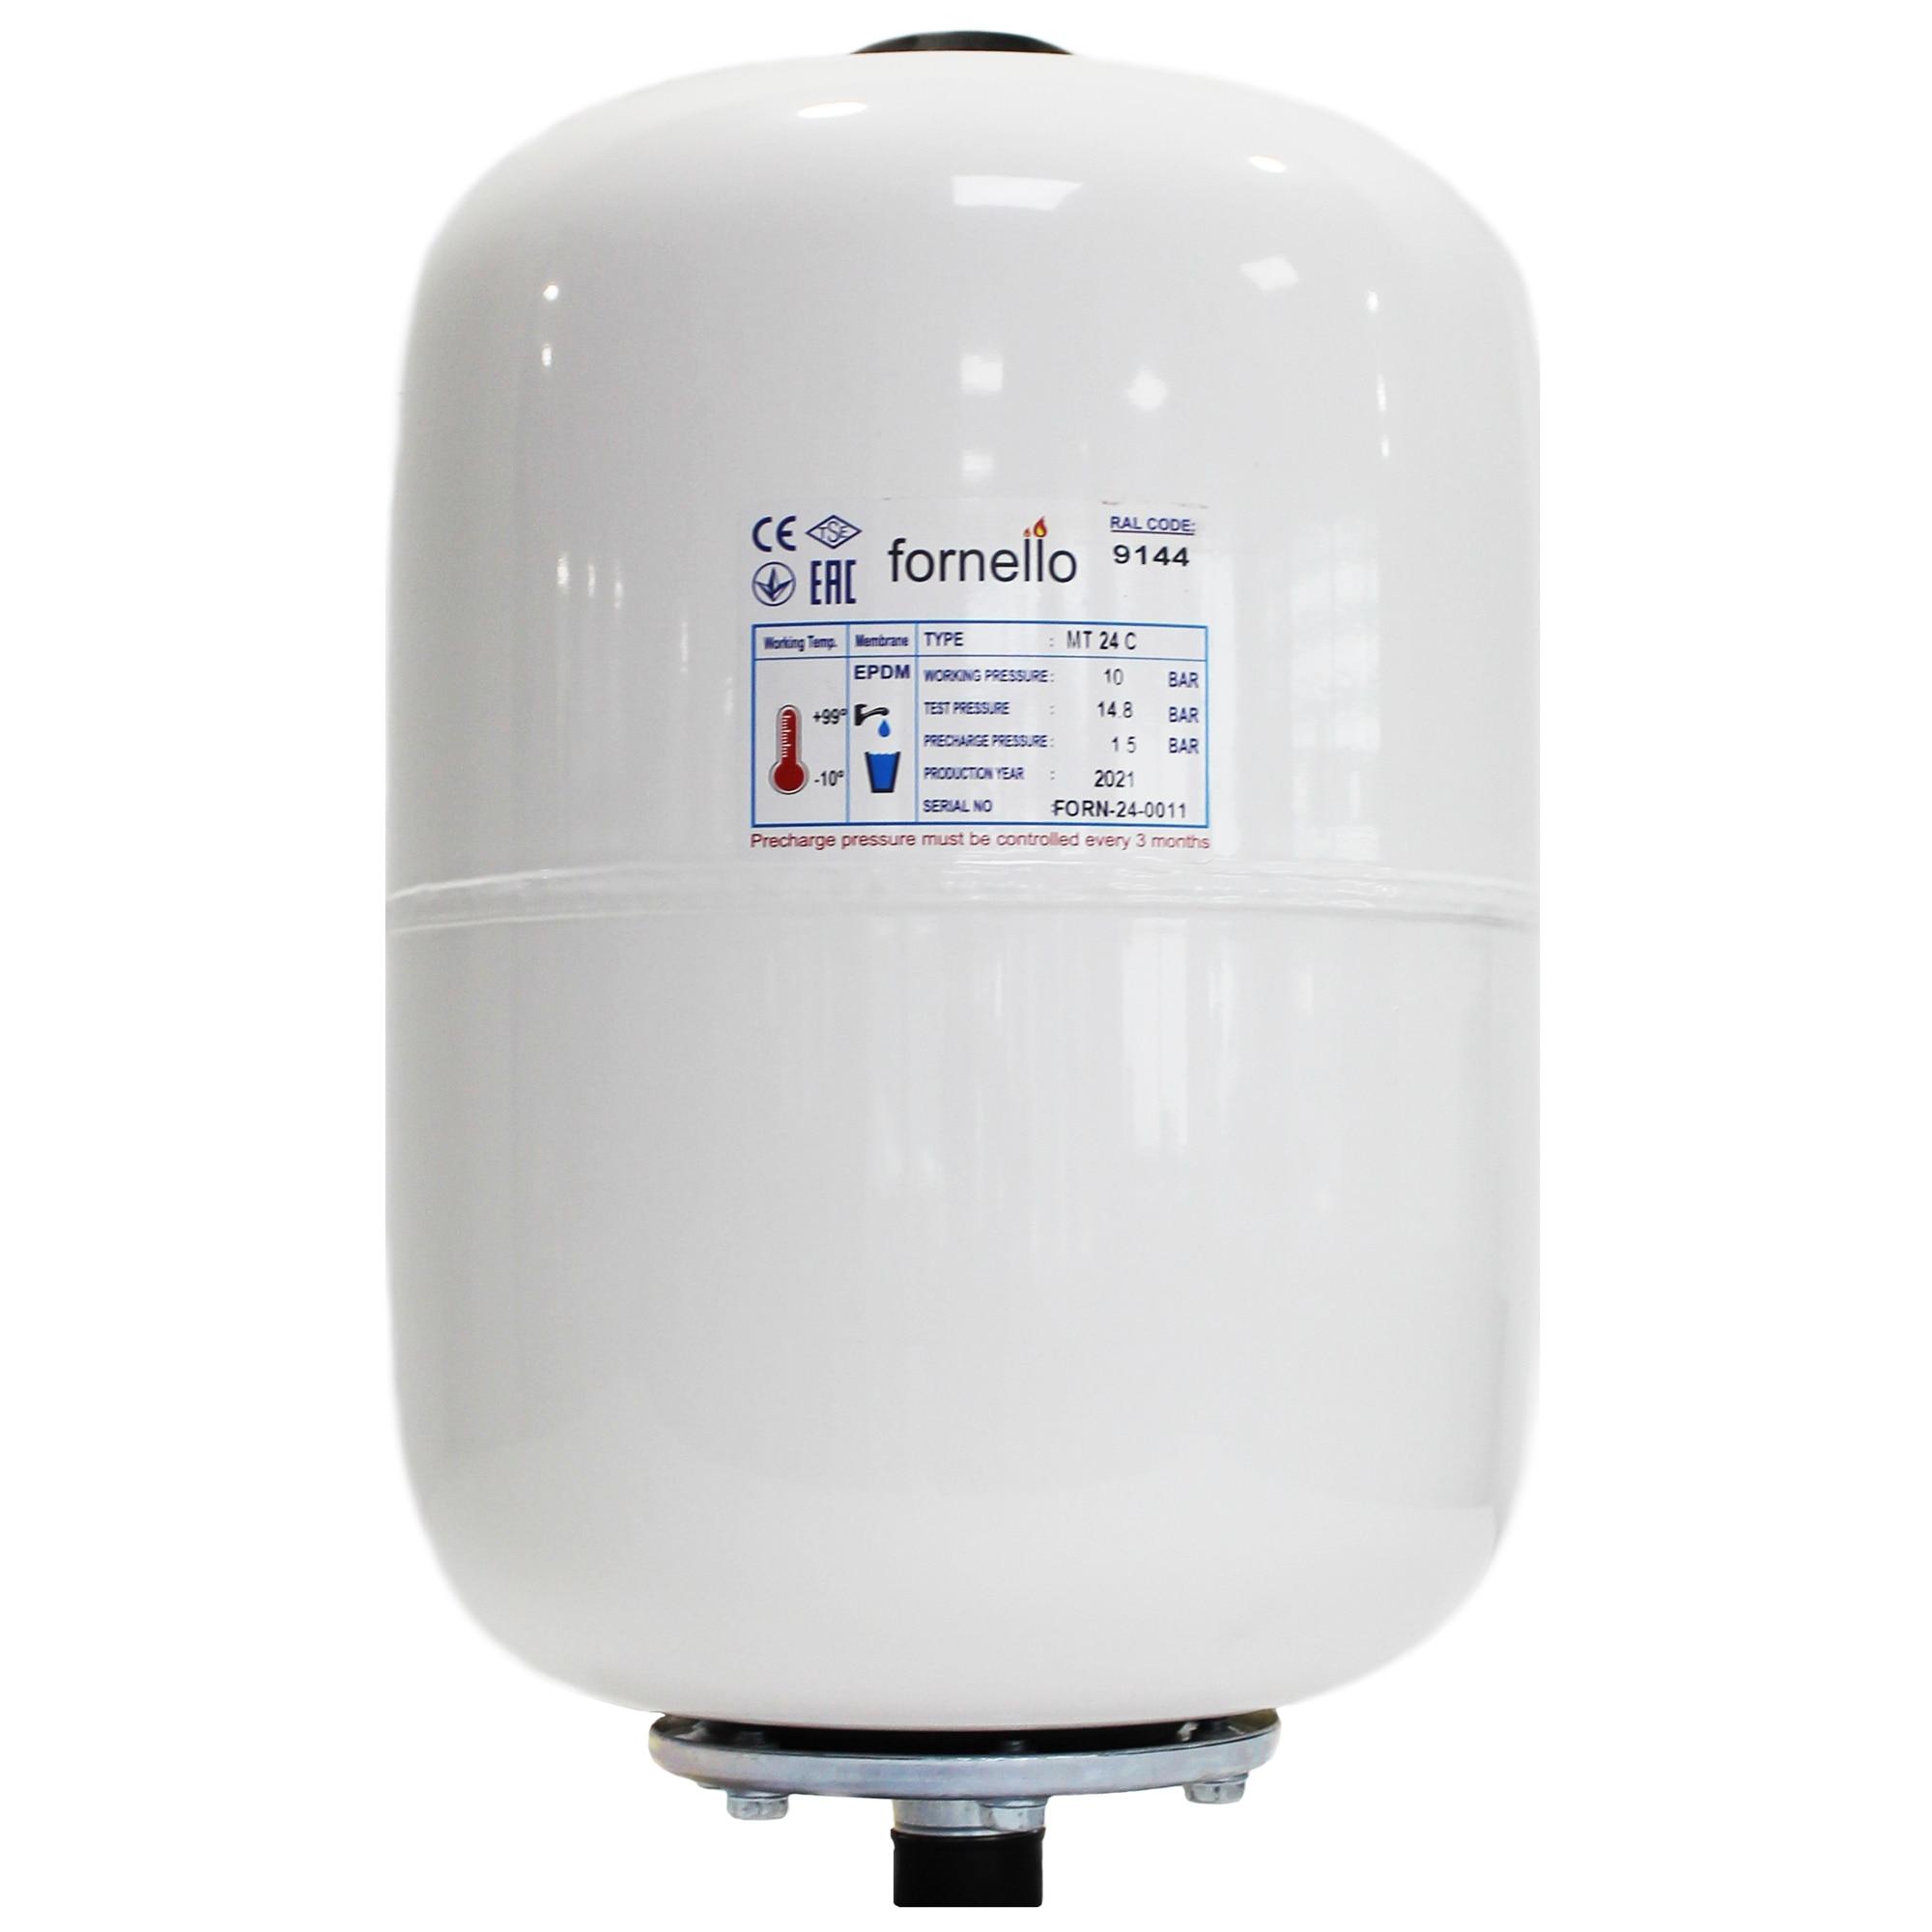 Fotografie Vas expansiune sanitar Fornello, 24 litri, vertical, culoare alb, presiune maxima 10 bar, membrana EPDM